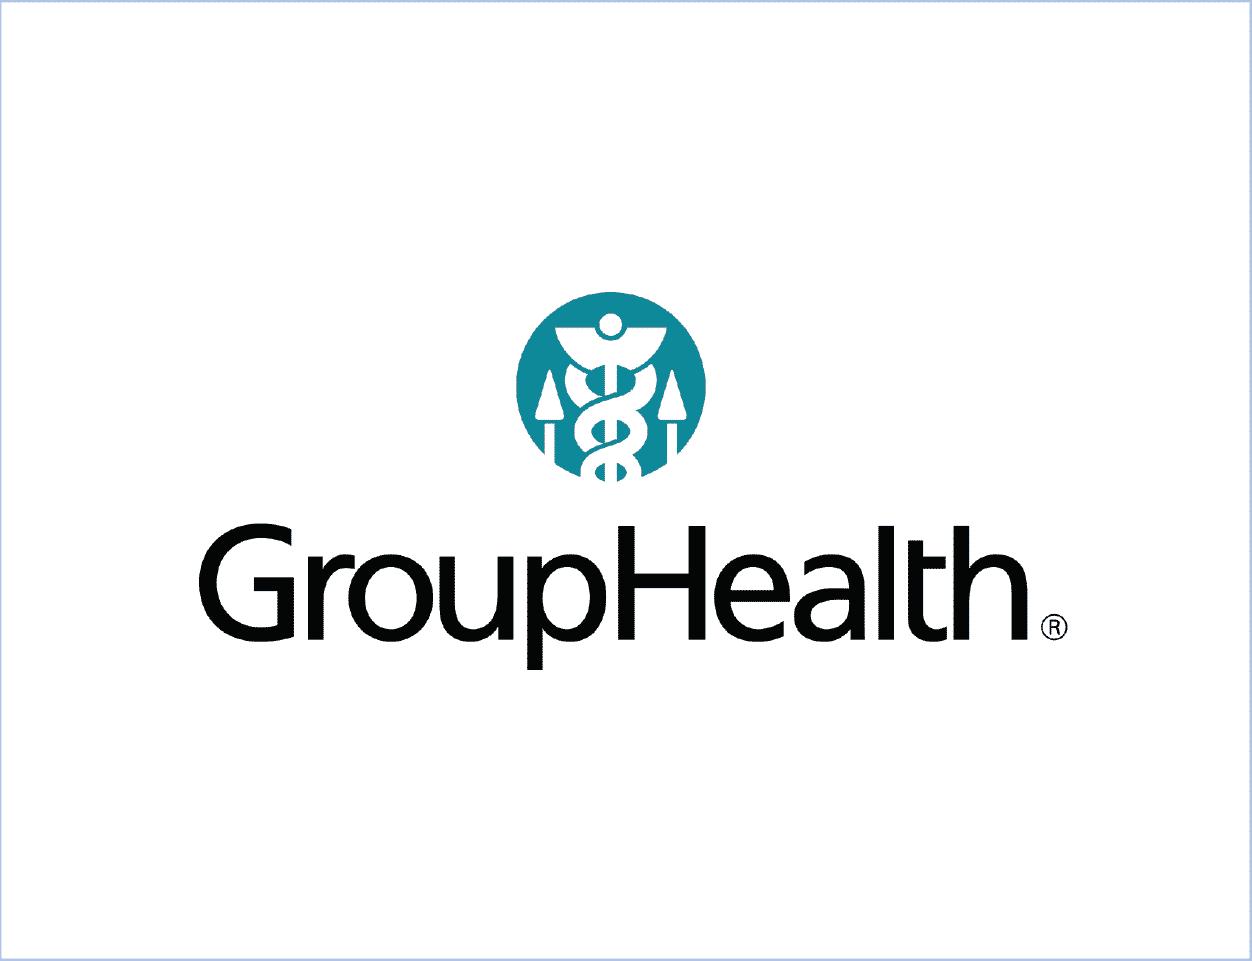 GroupHealth